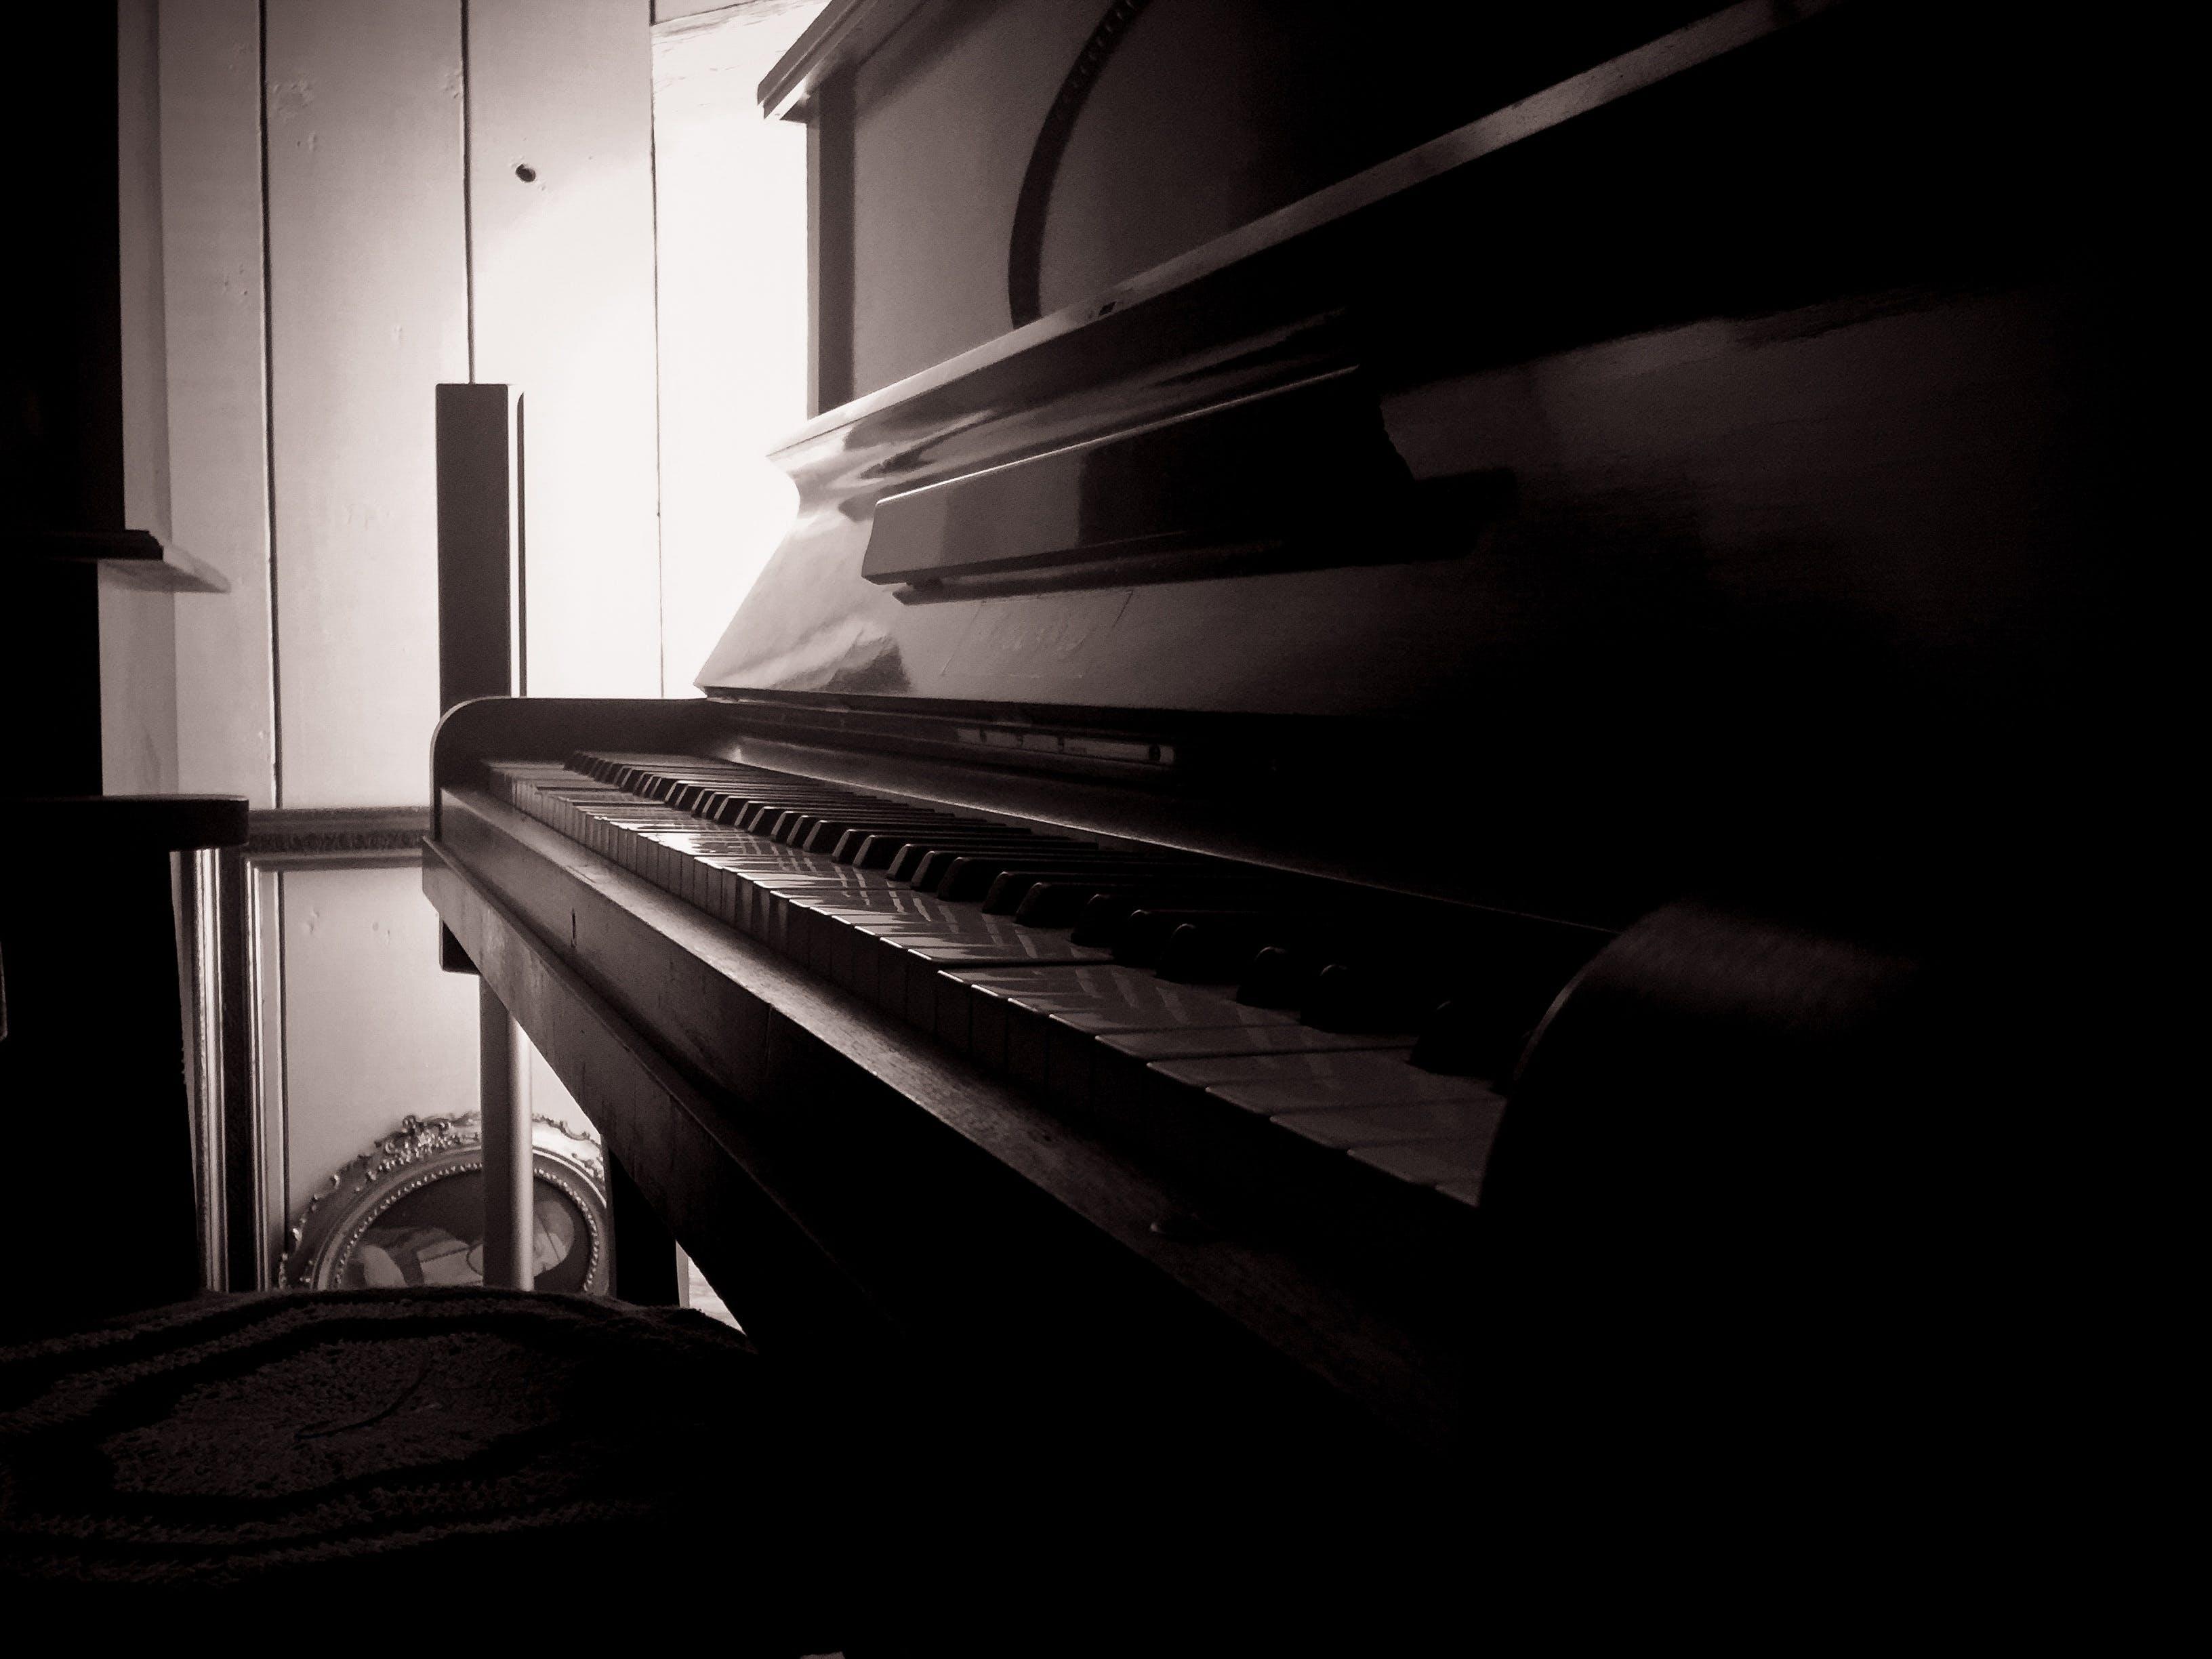 Free stock photo of music, piano, rest, romance